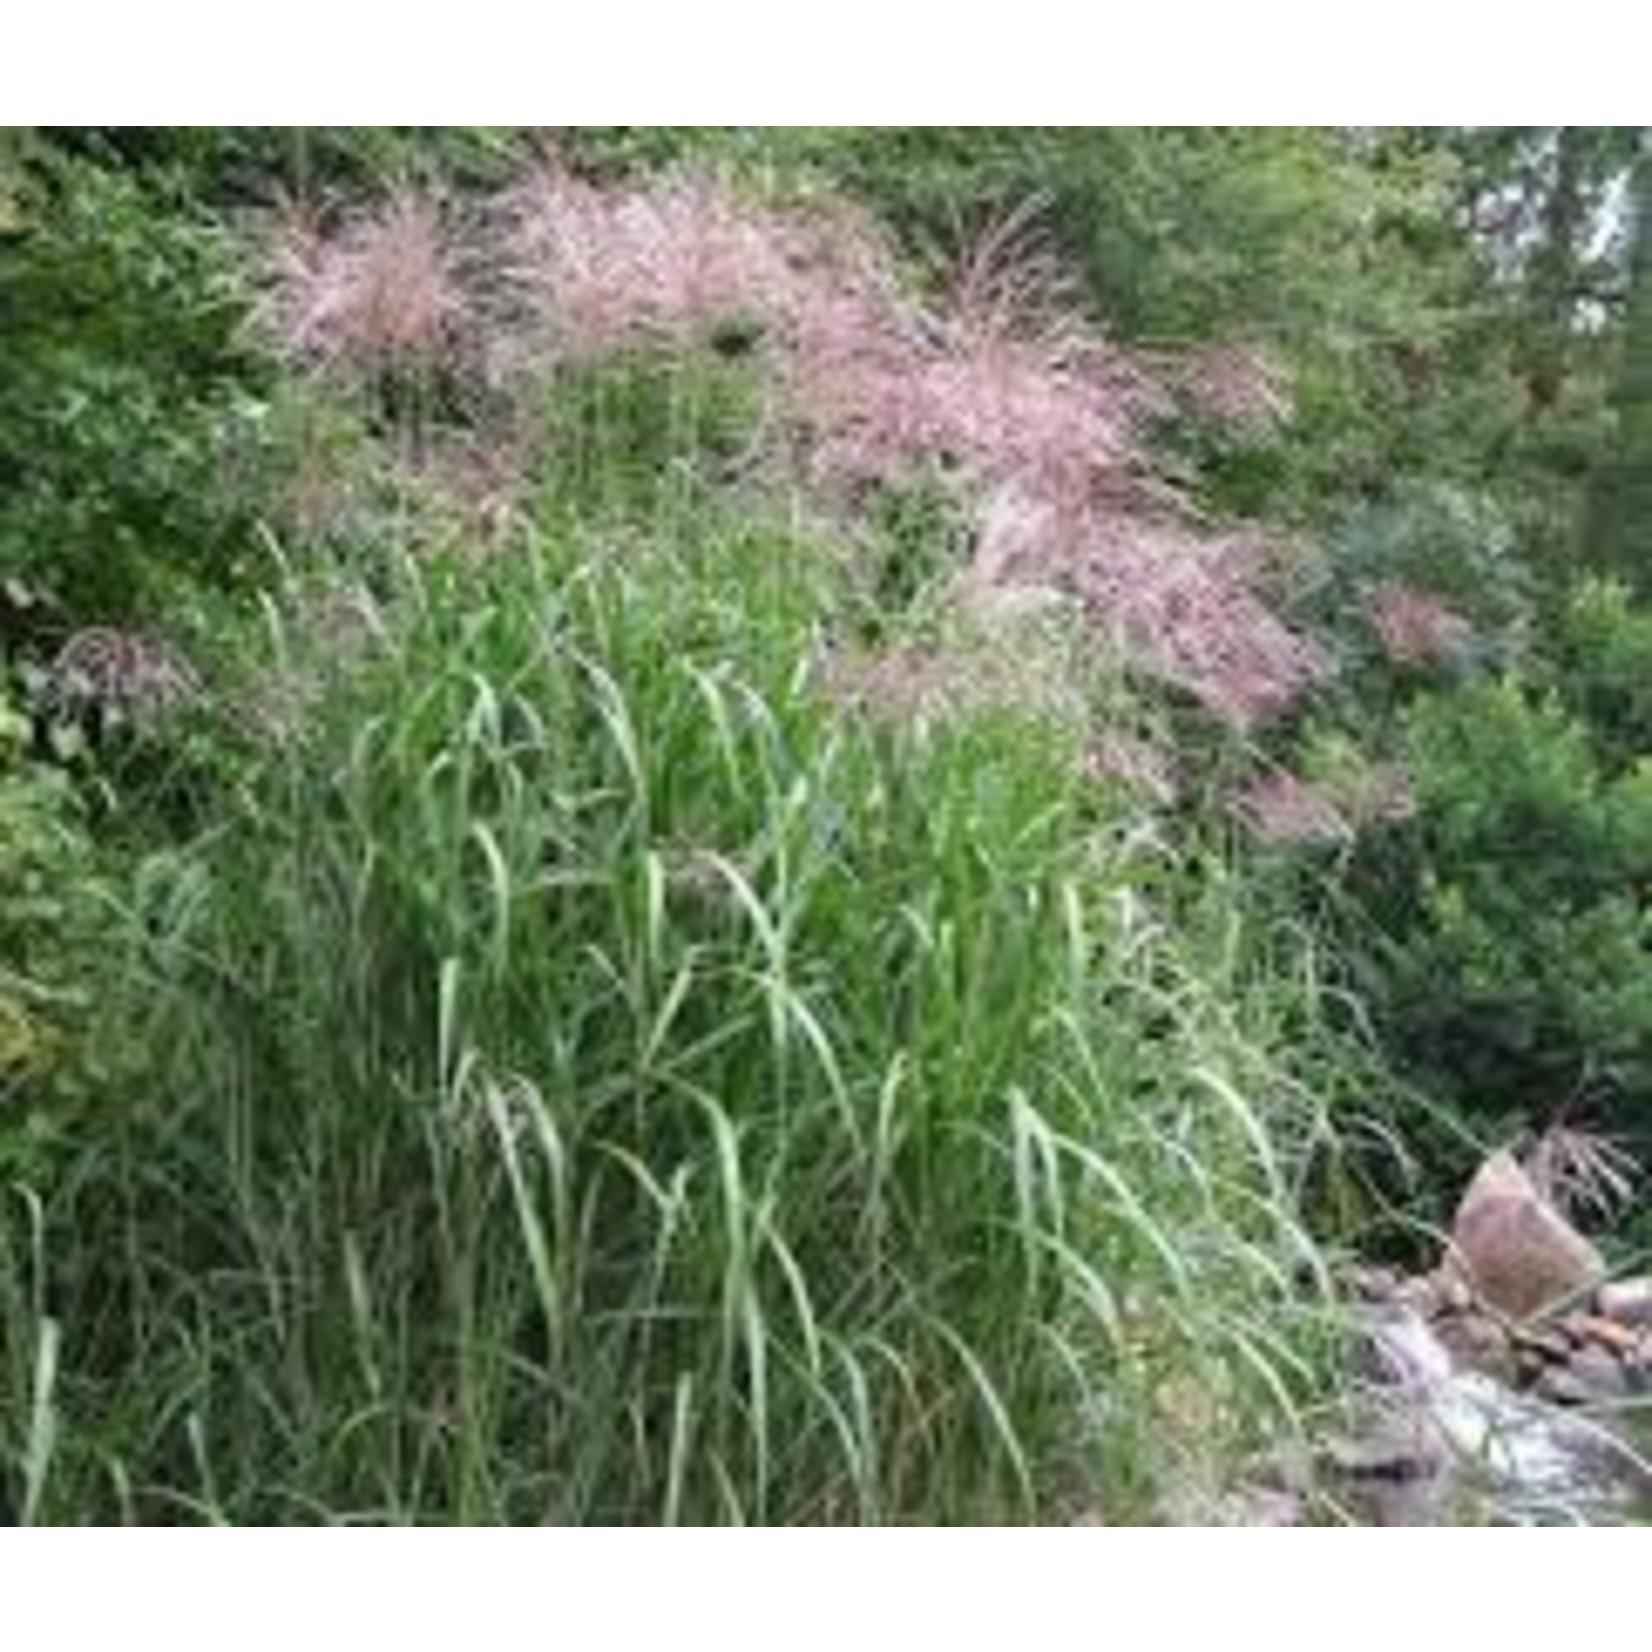 Giant Maiden Grass (silver grass) - Miscanthus Giganteus 1 GAL